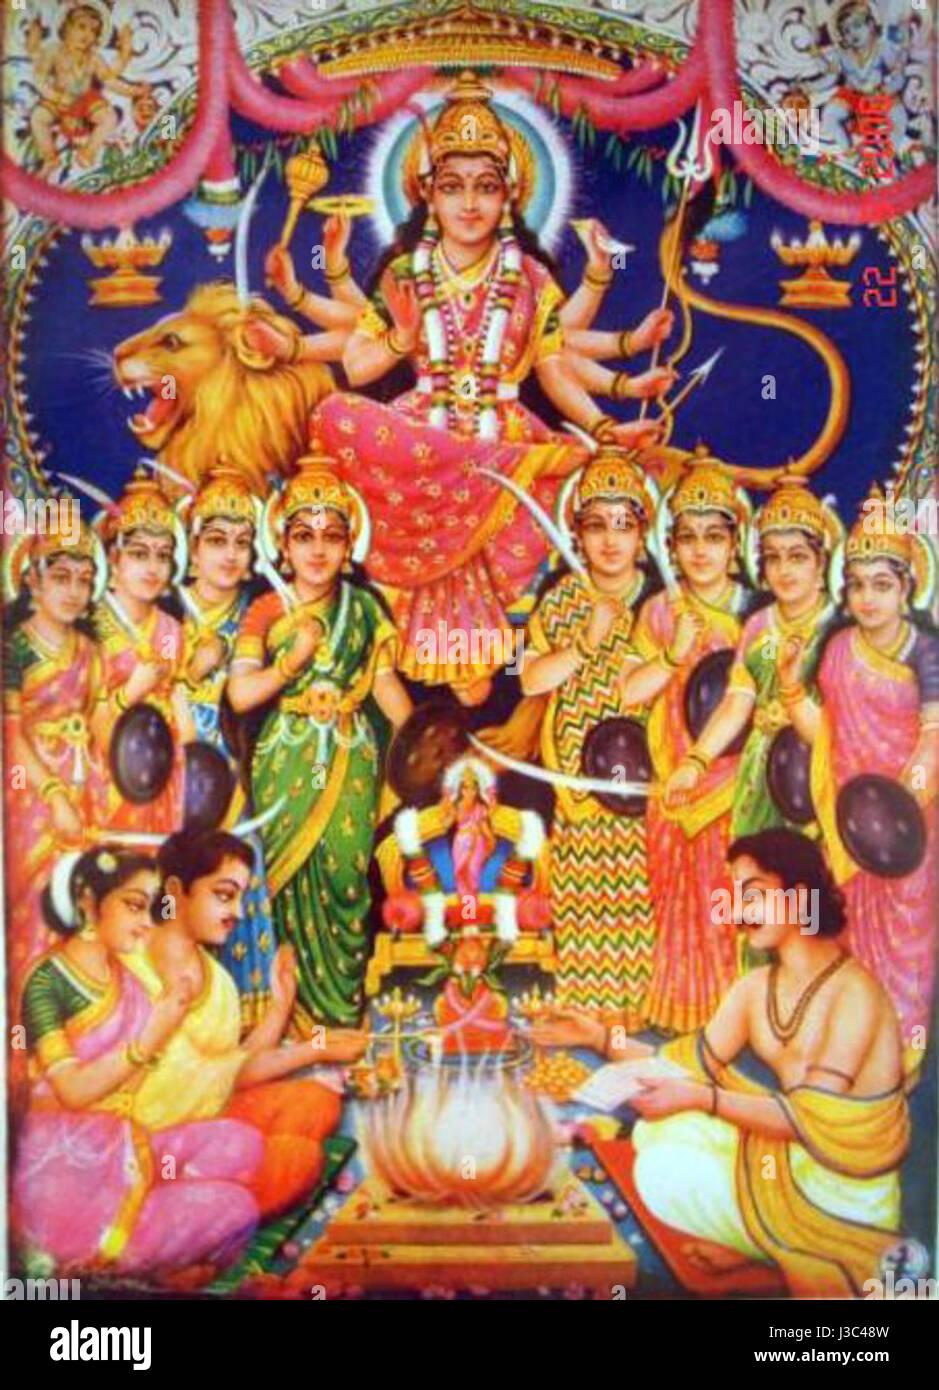 Durga presiede un fuoco vedico sacrificio (bazaar arte, c.1950's) Immagini Stock